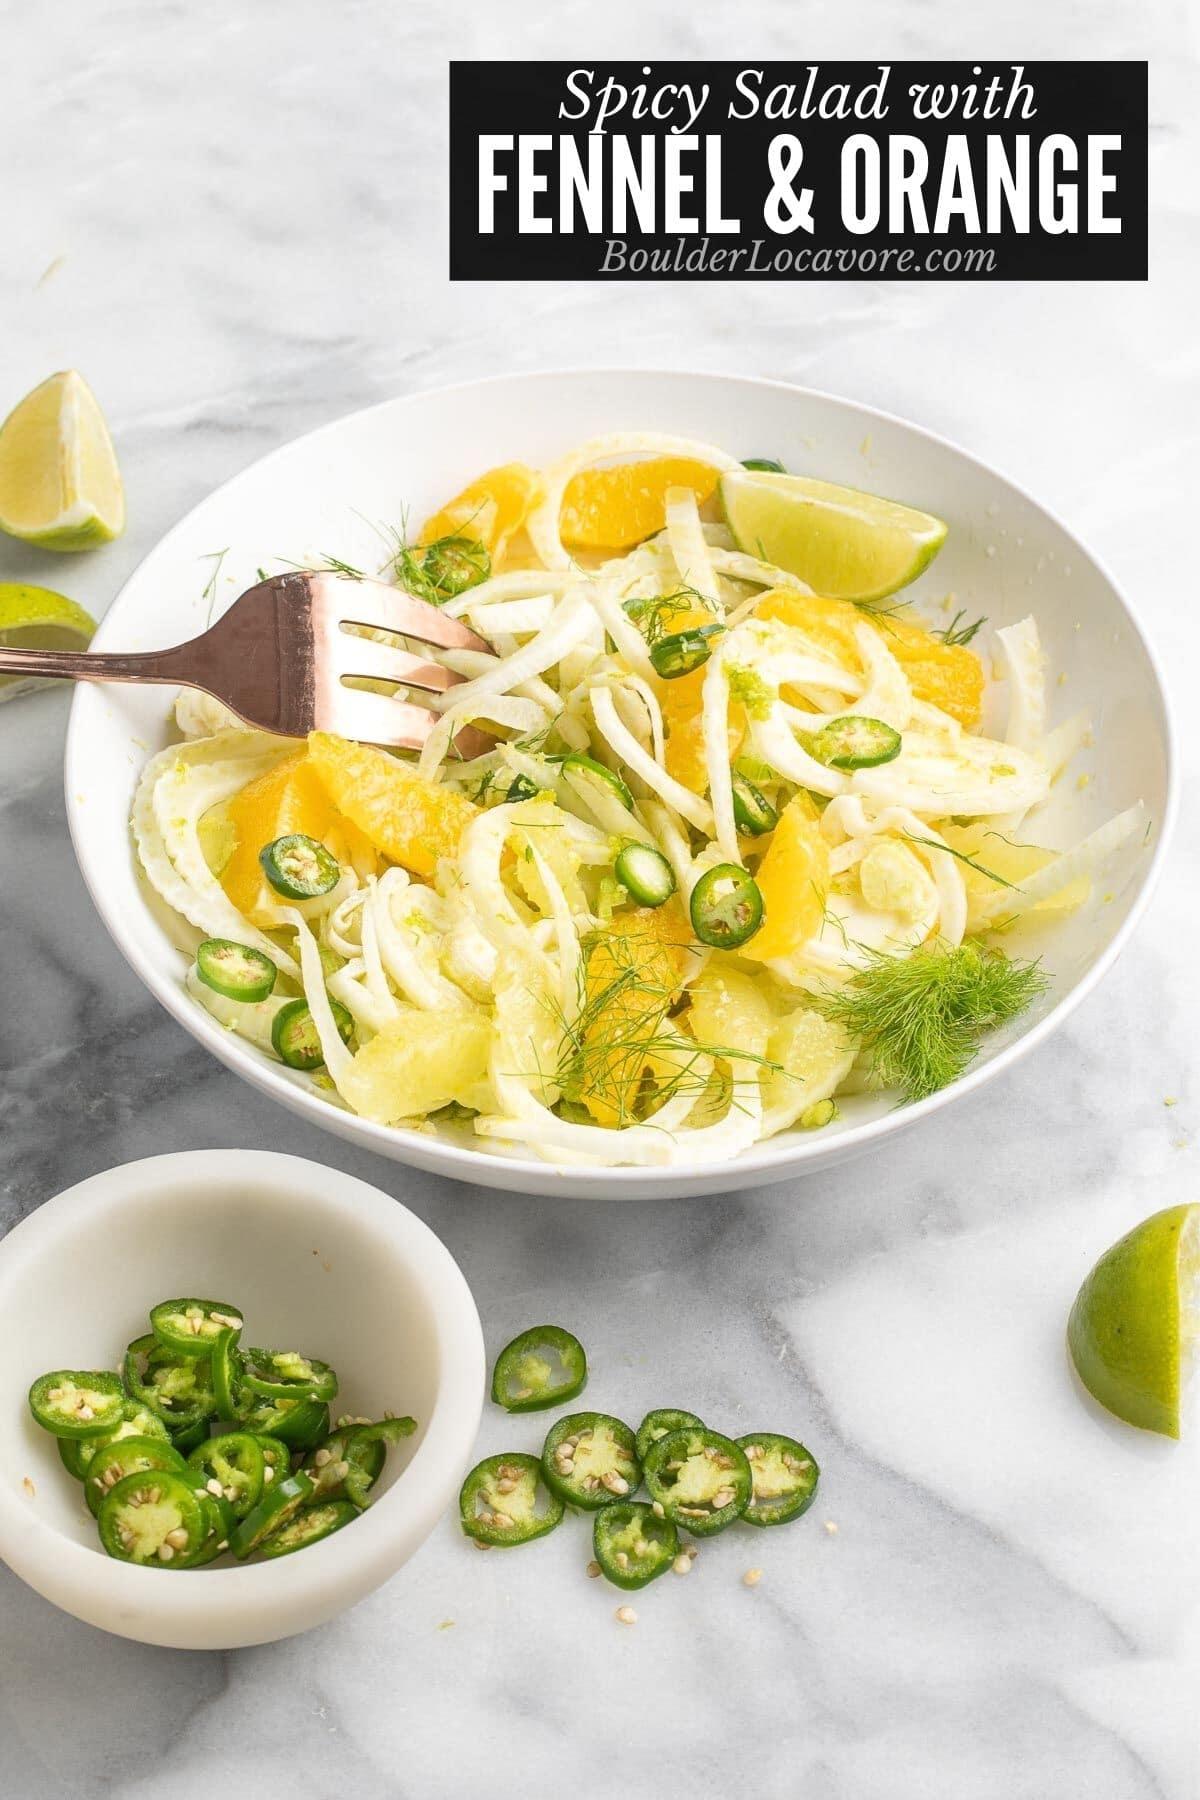 Fennel and Orange Salad title